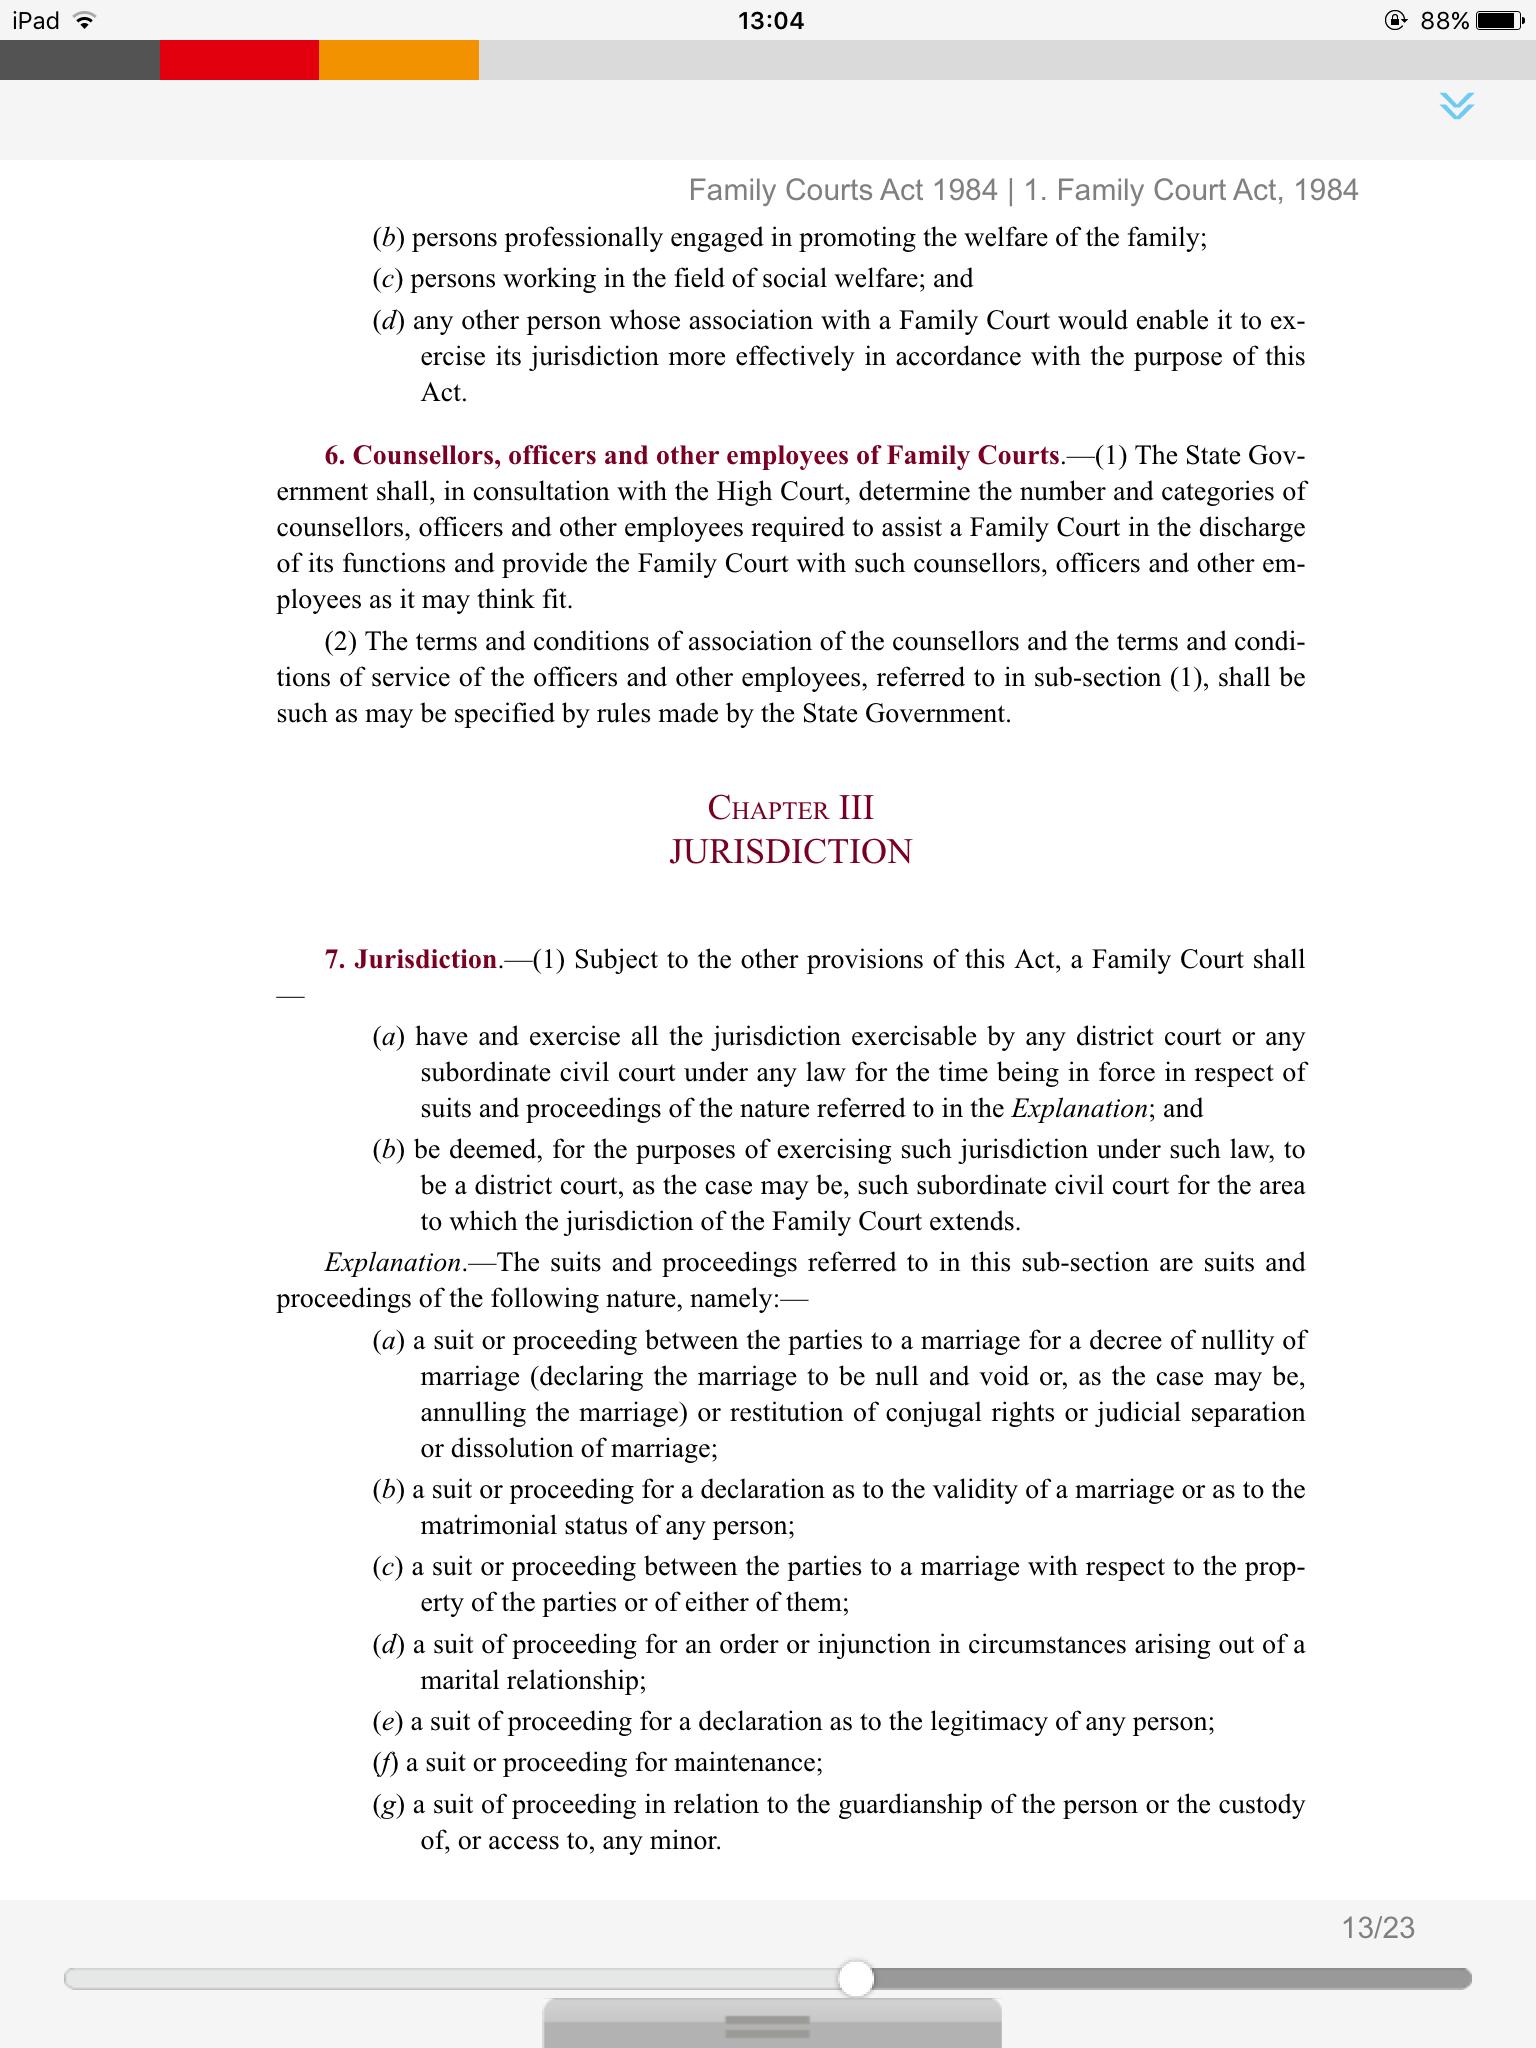 jurisdiction in hindi